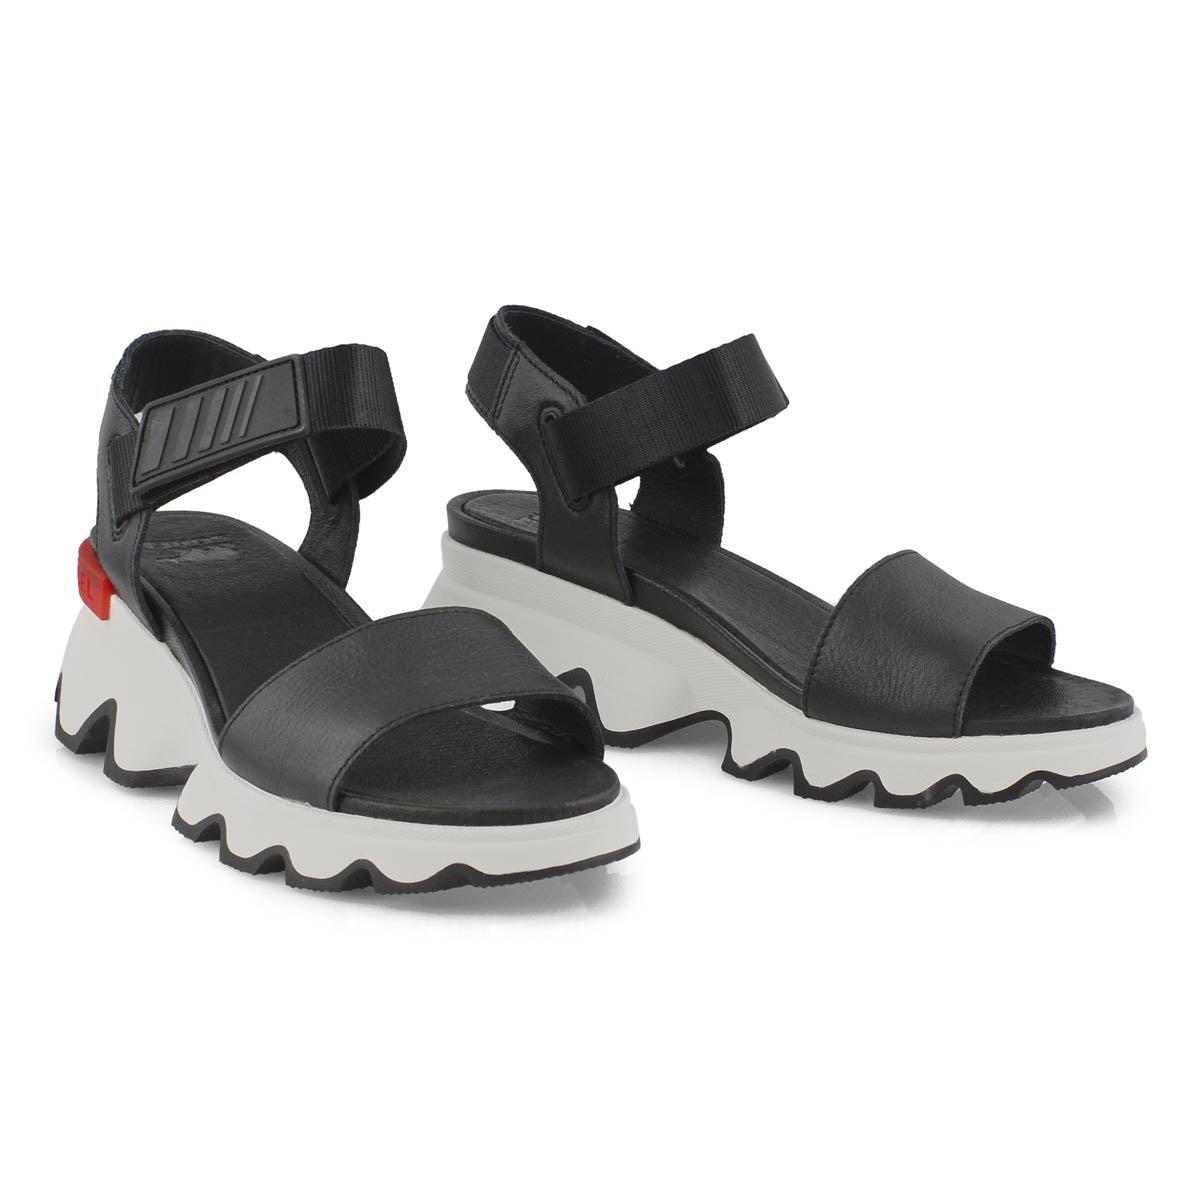 Lds Kinetic black casual sandal